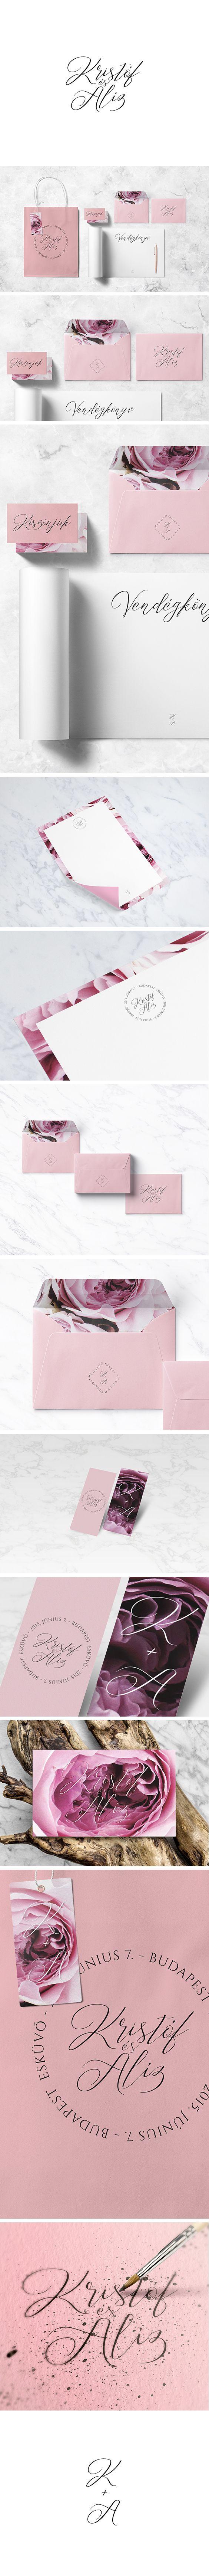 Kristóf + Alíz - Wedding Branding by ZIIJN https://ziijn.myportfolio.com